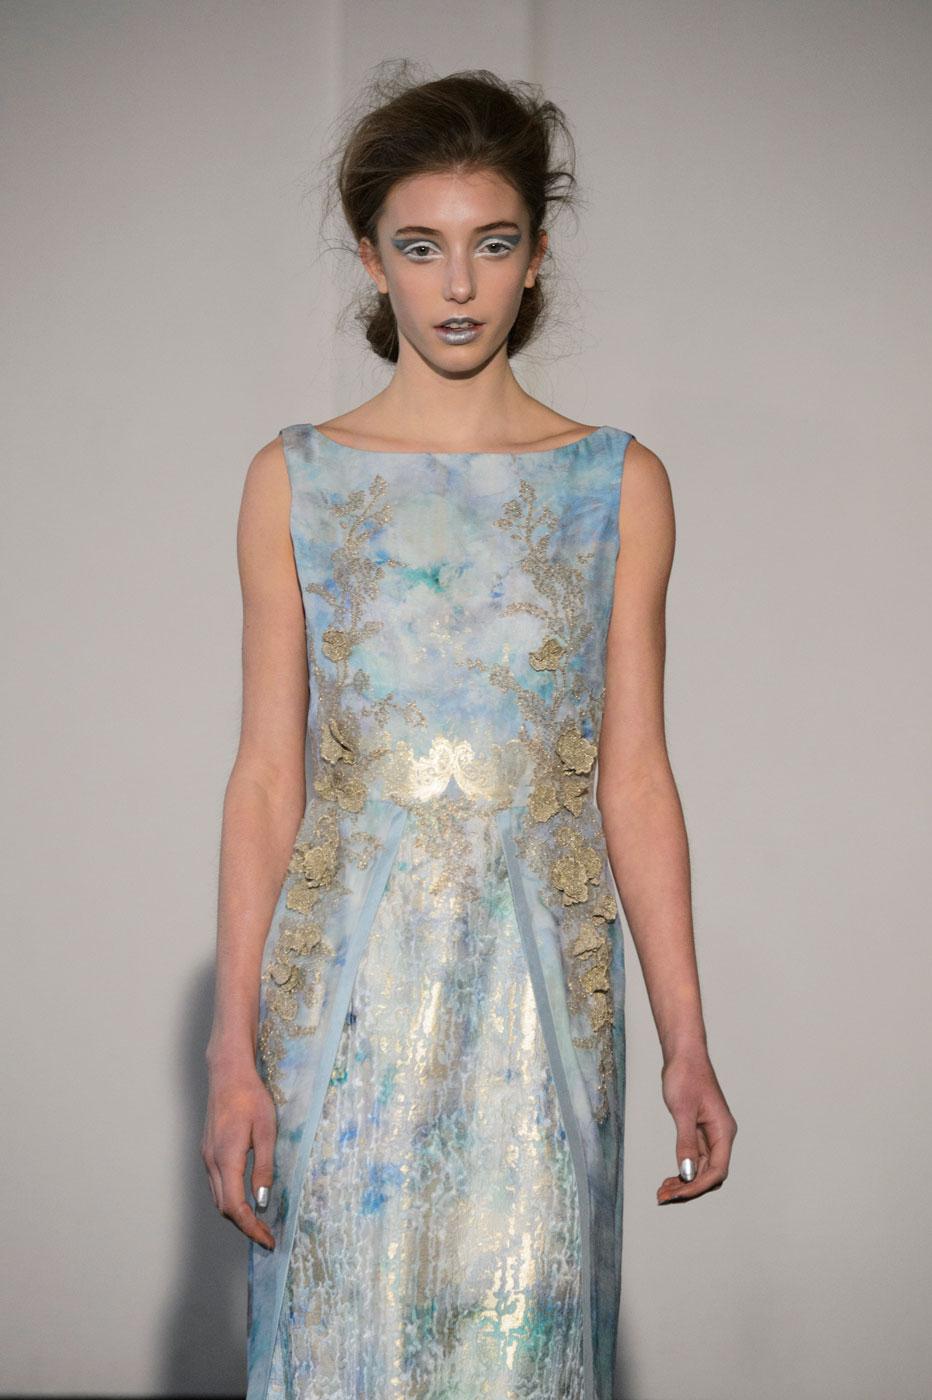 Busardi-fashion-runway-show-haute-couture-paris-spring-2015-the-impression-50